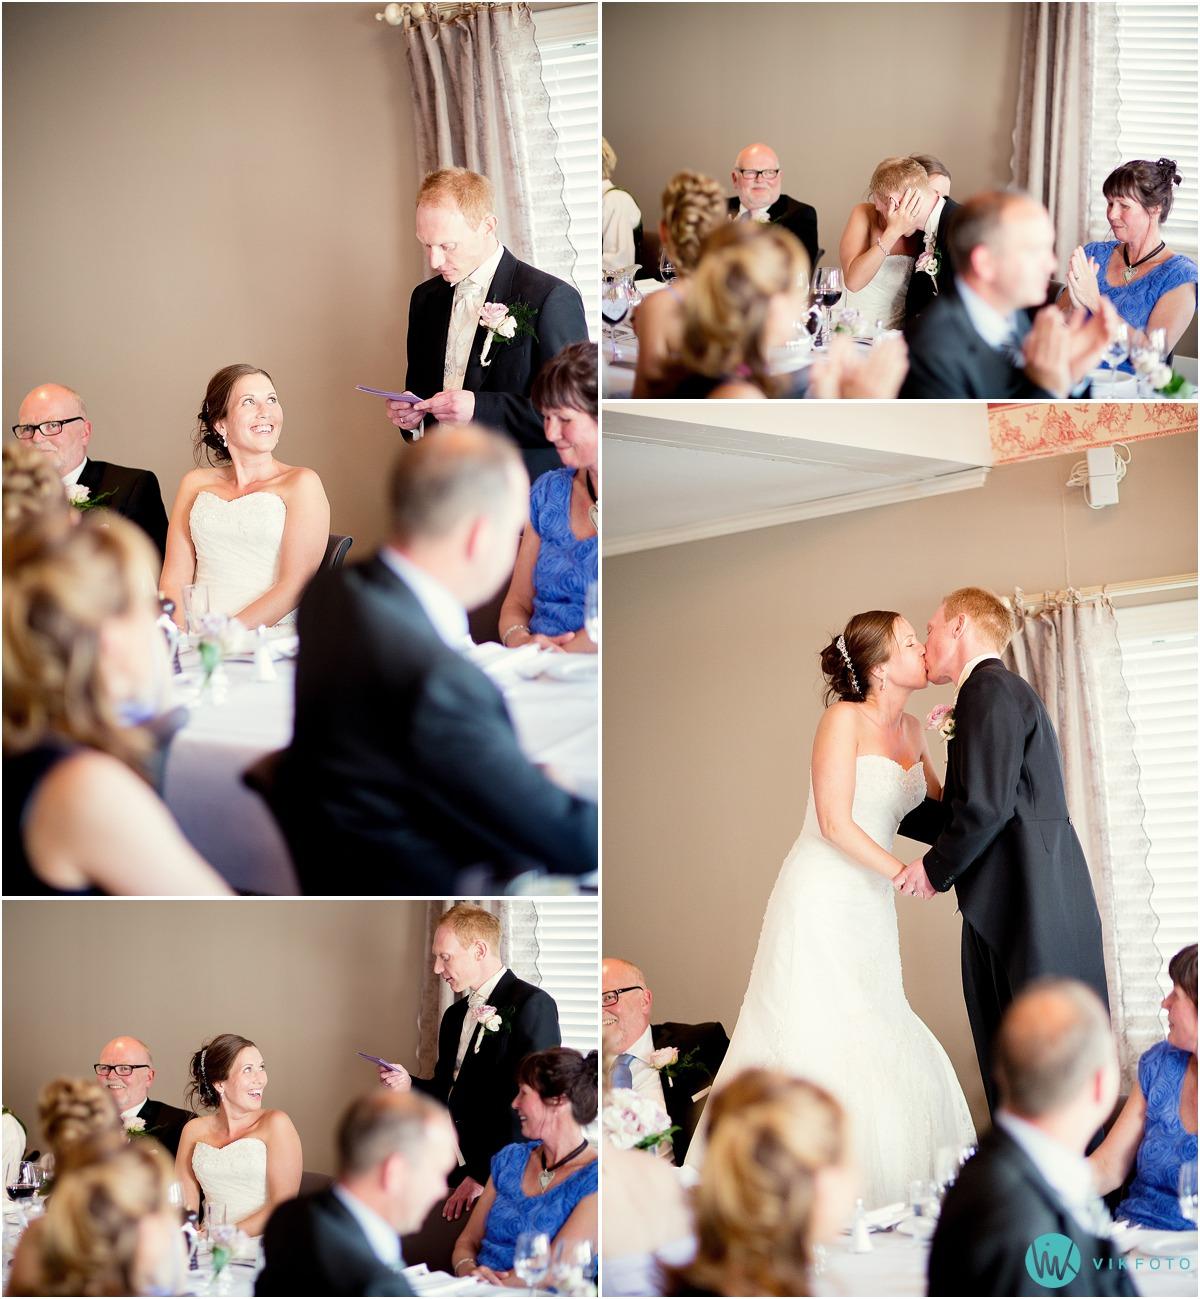 59-bryllup-bryllupstale-brudgommens-tale.jpg